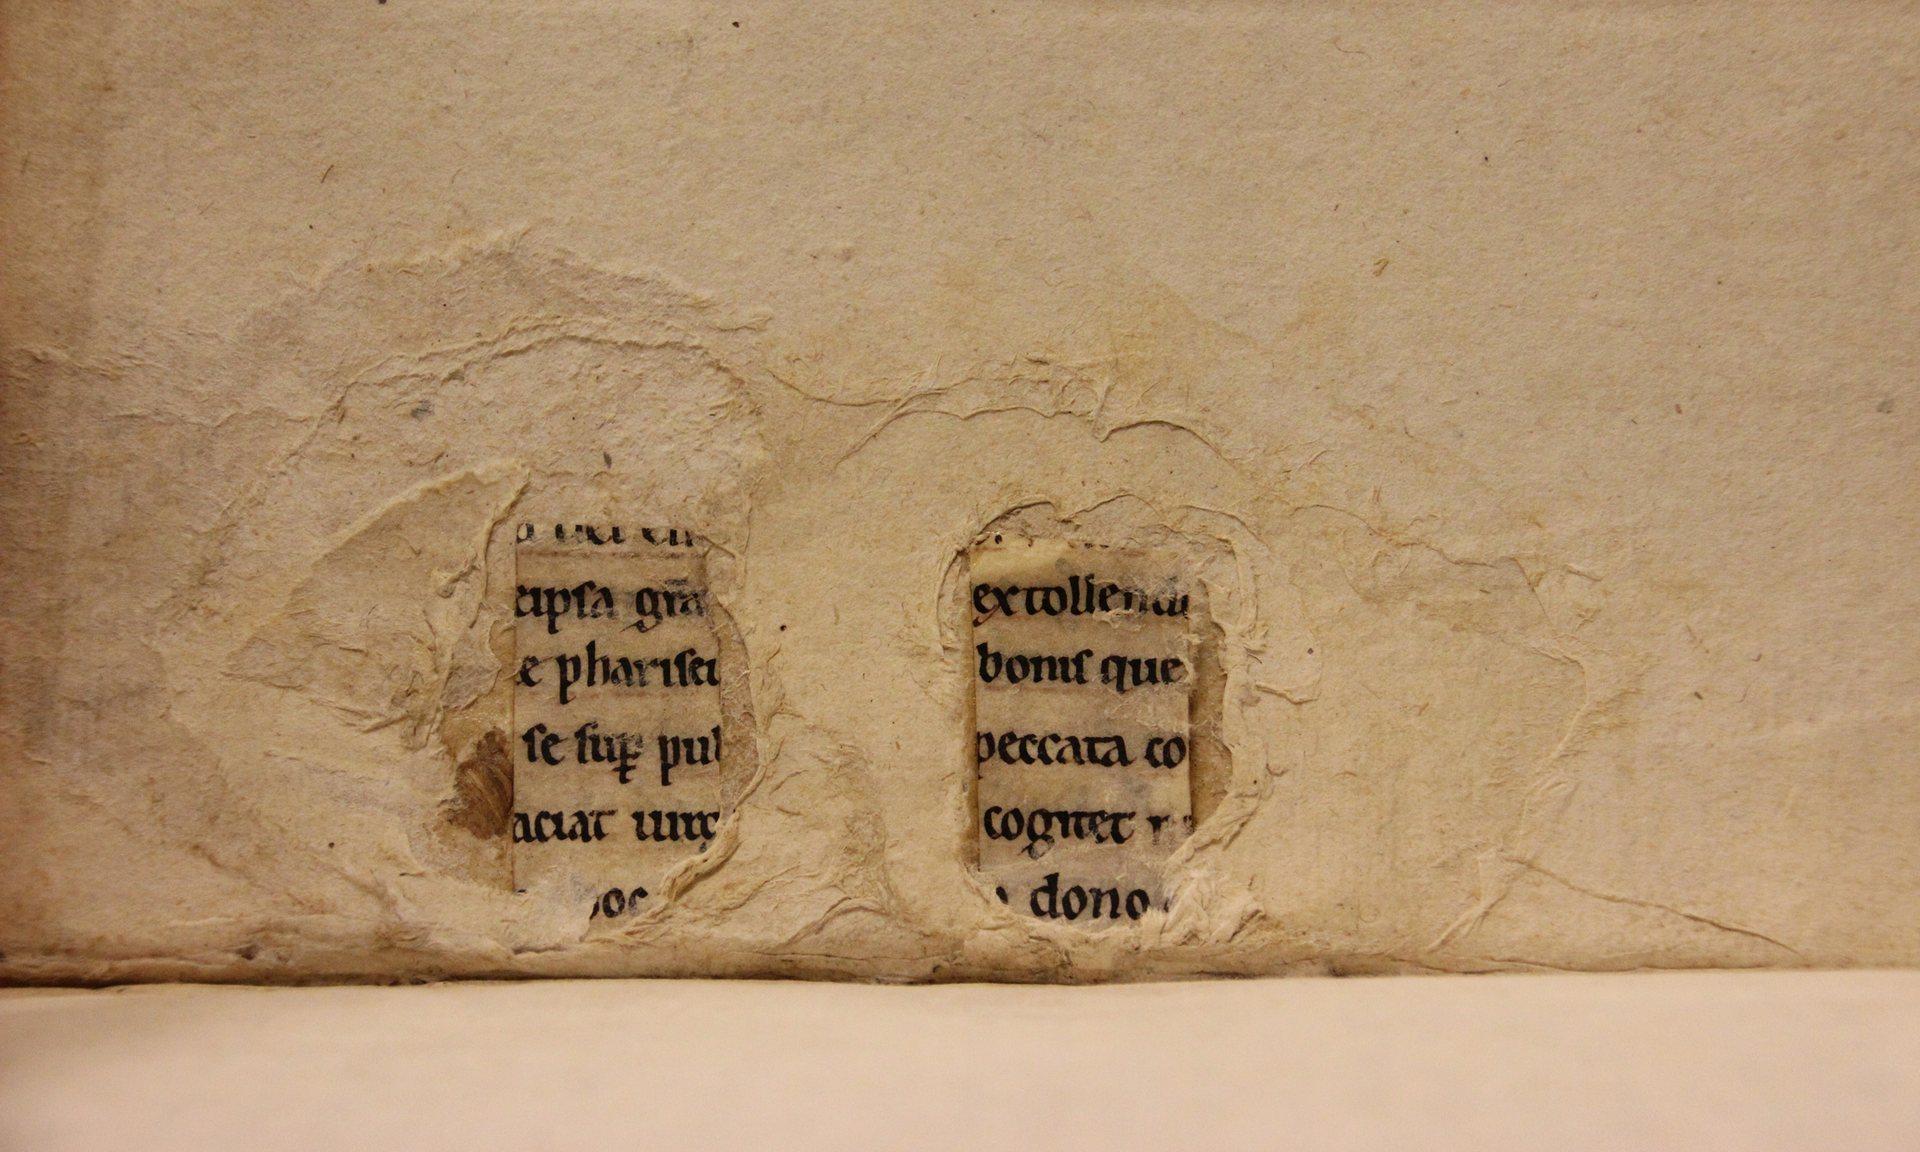 Otro ejemplo de fragmento de texto oculto (foto de Erik Kwakkel)